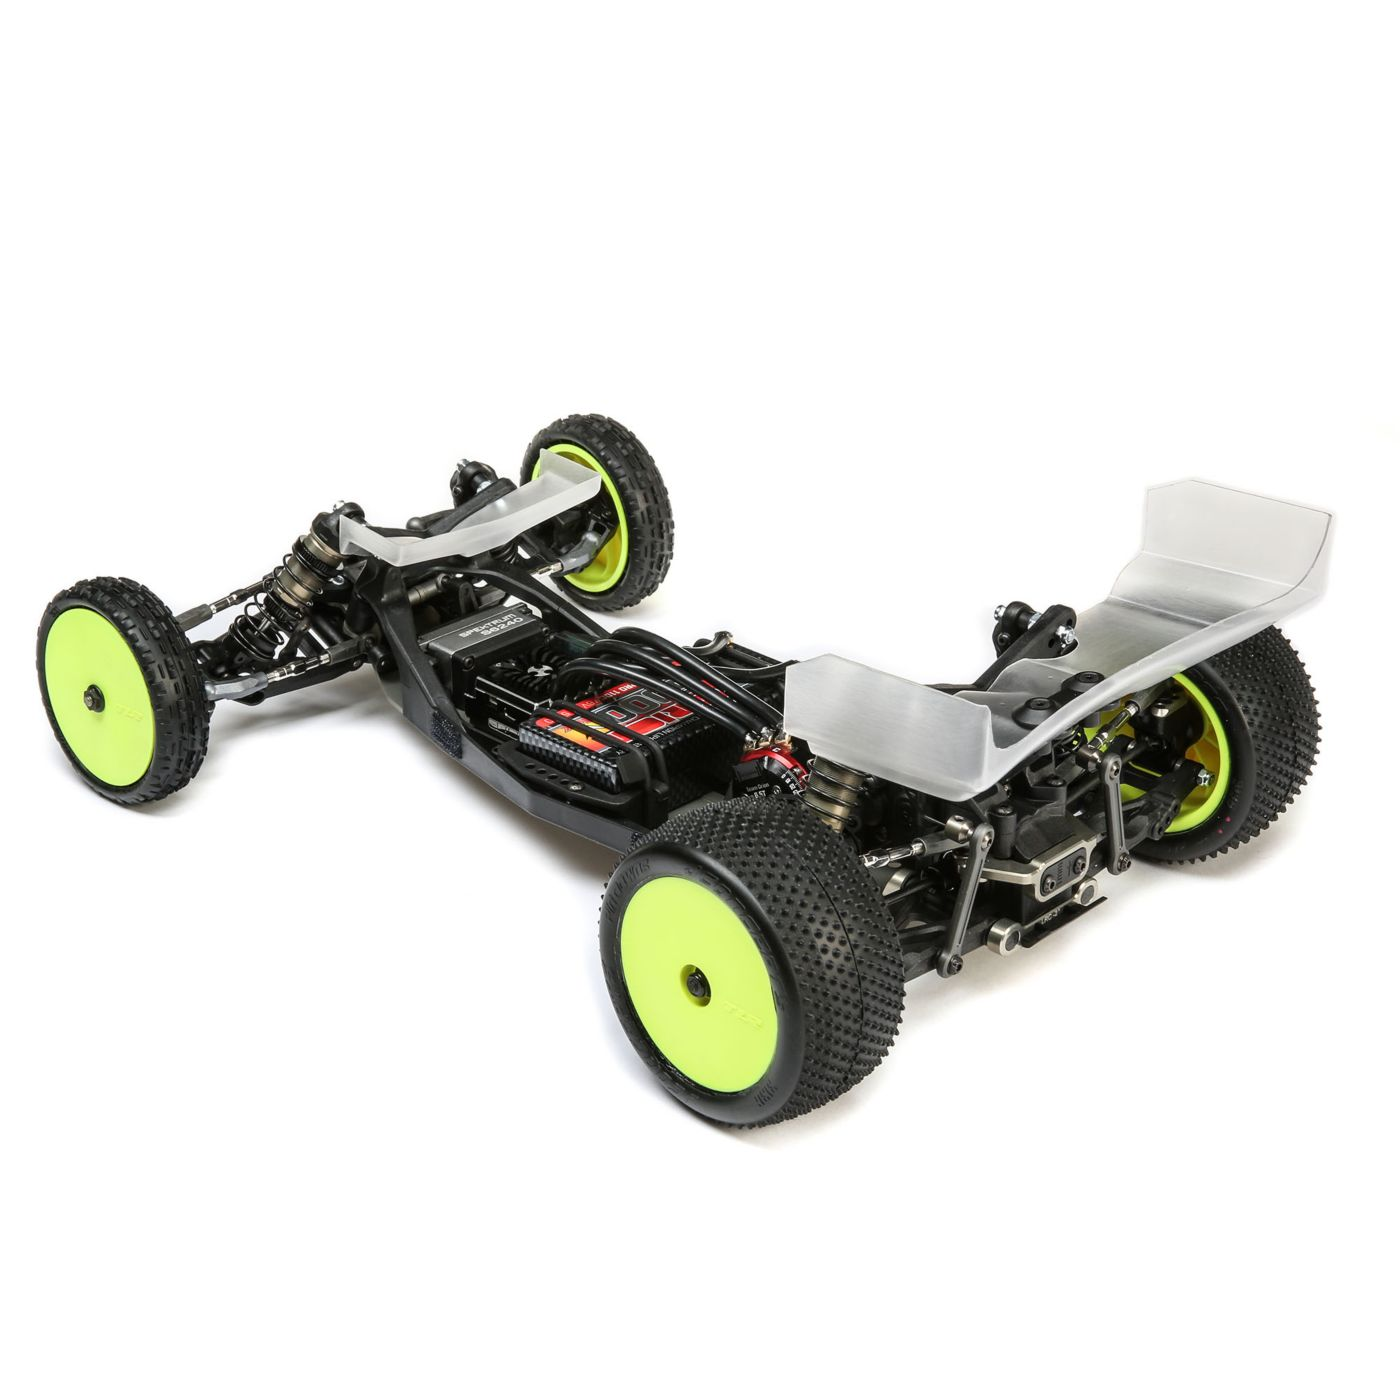 22 5.0 TLR234095 Team Losi Racing Front Arm Set Stiffezel